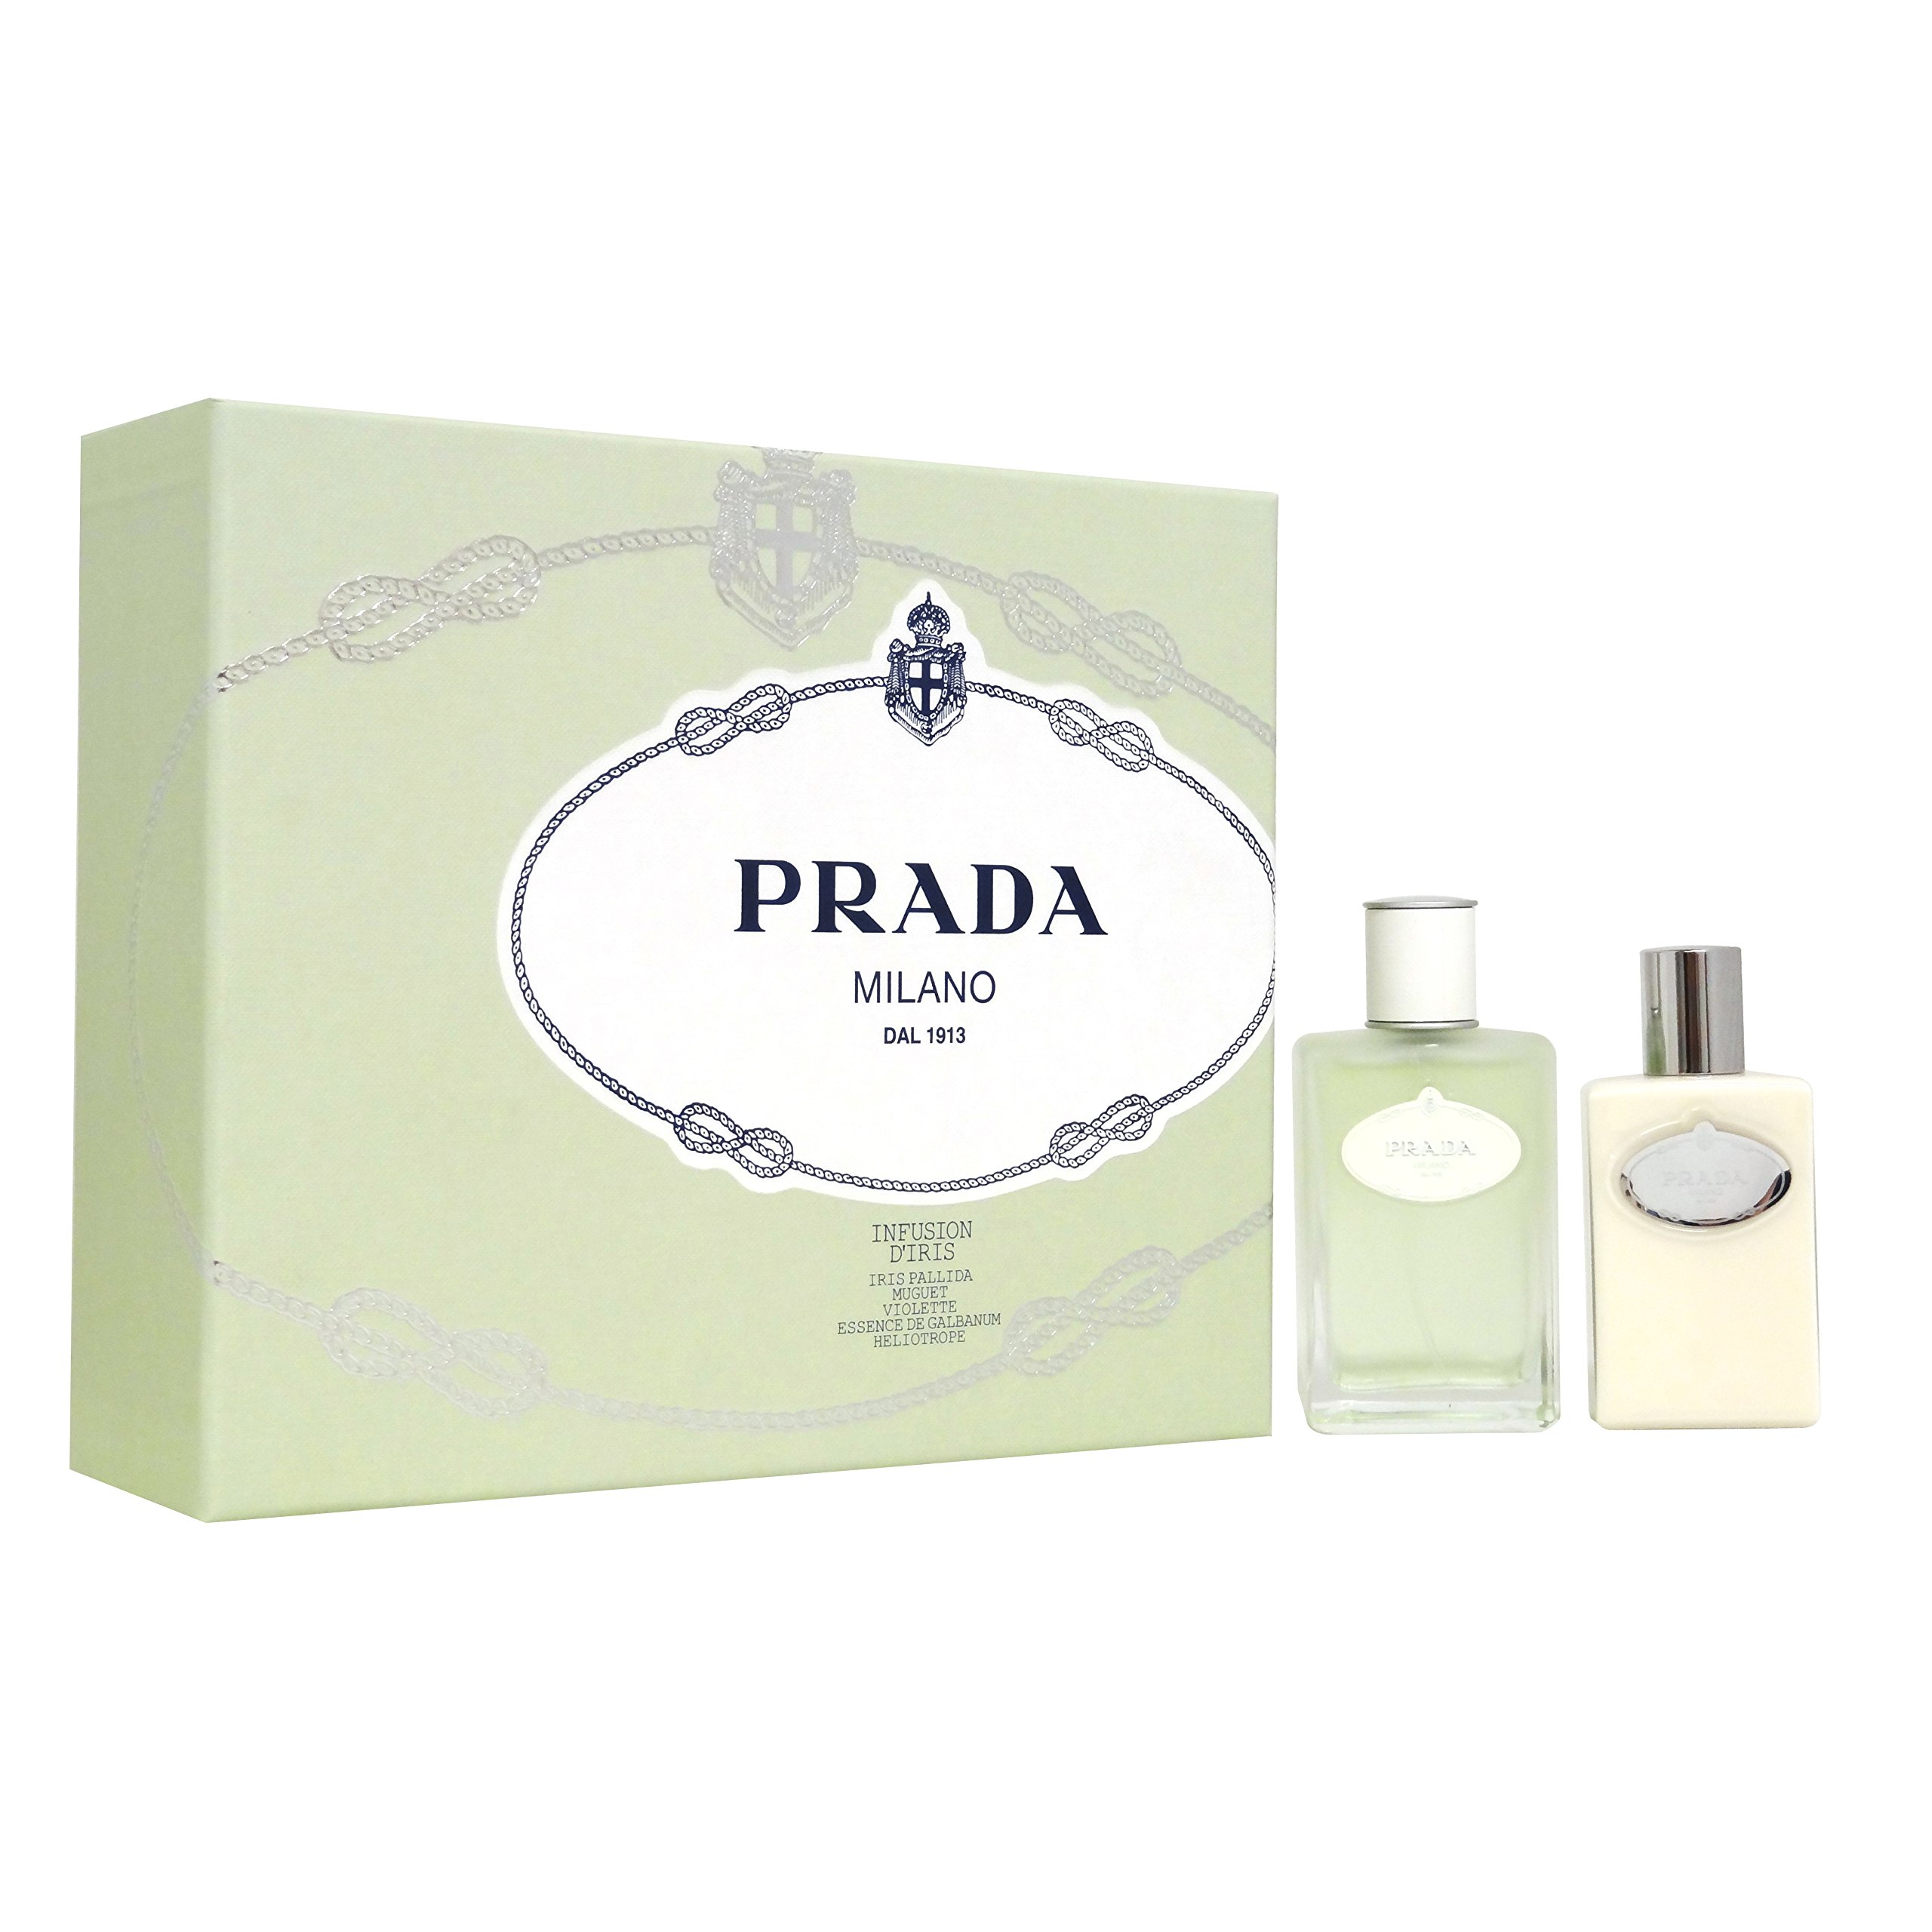 Prada Milano Infusion D'iris for Women Gift Set (Eau de Toilette Spray, Hydrating Body Lotion)